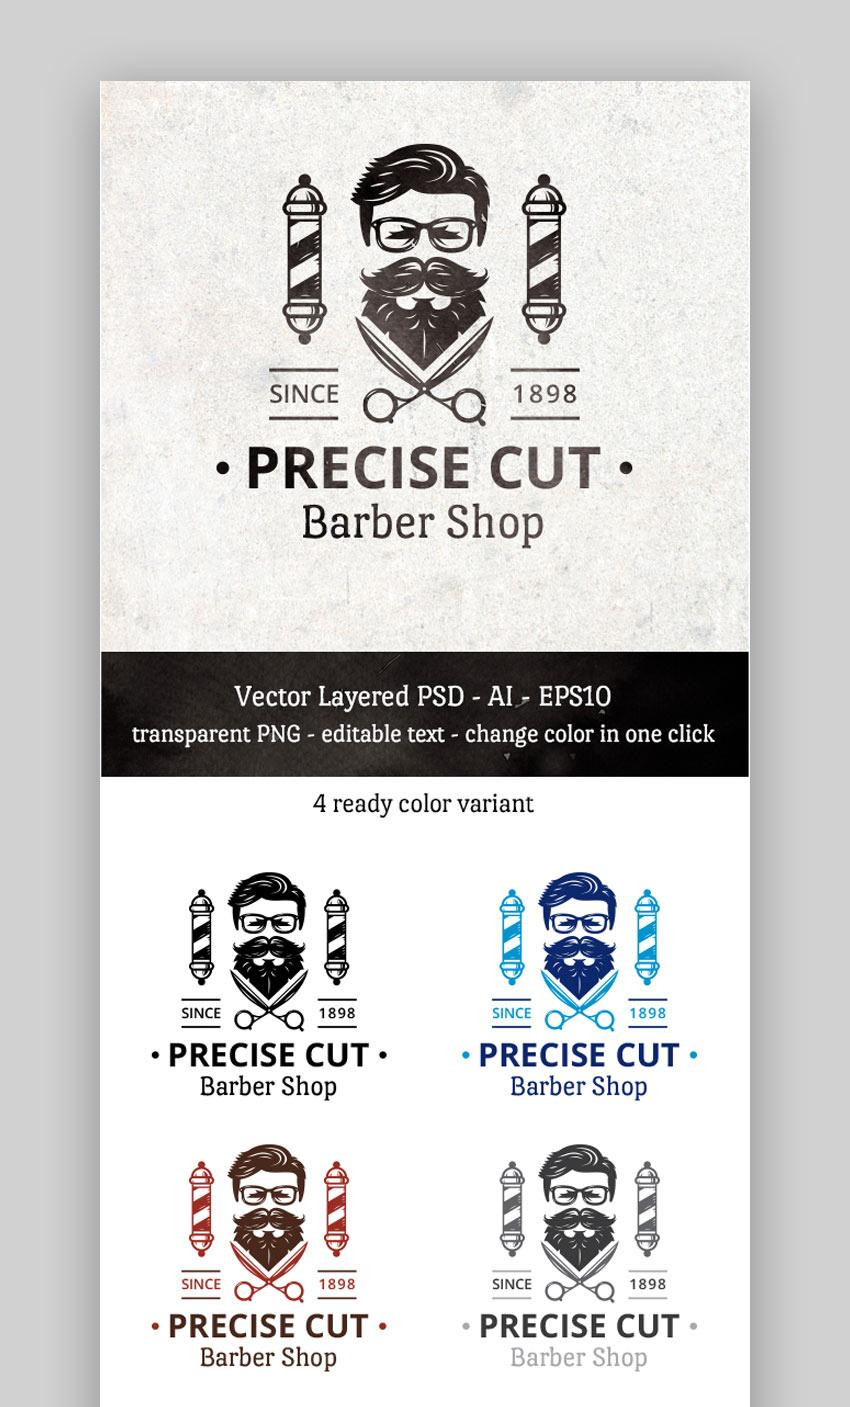 Precise Cut Barber Shop logo